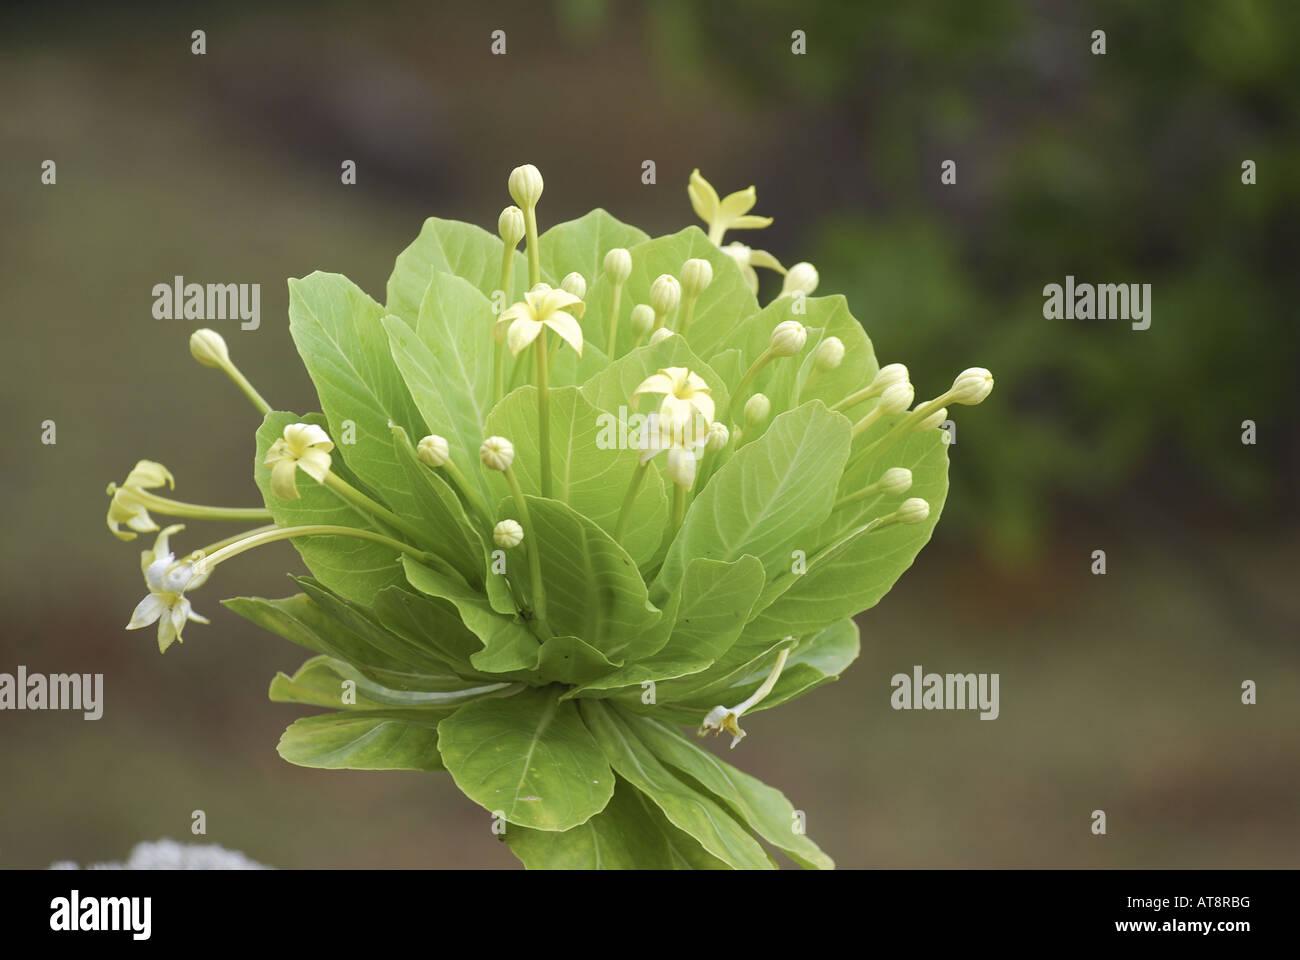 Rare Endangered Native Hawaiian Alula Plant Scientific Name